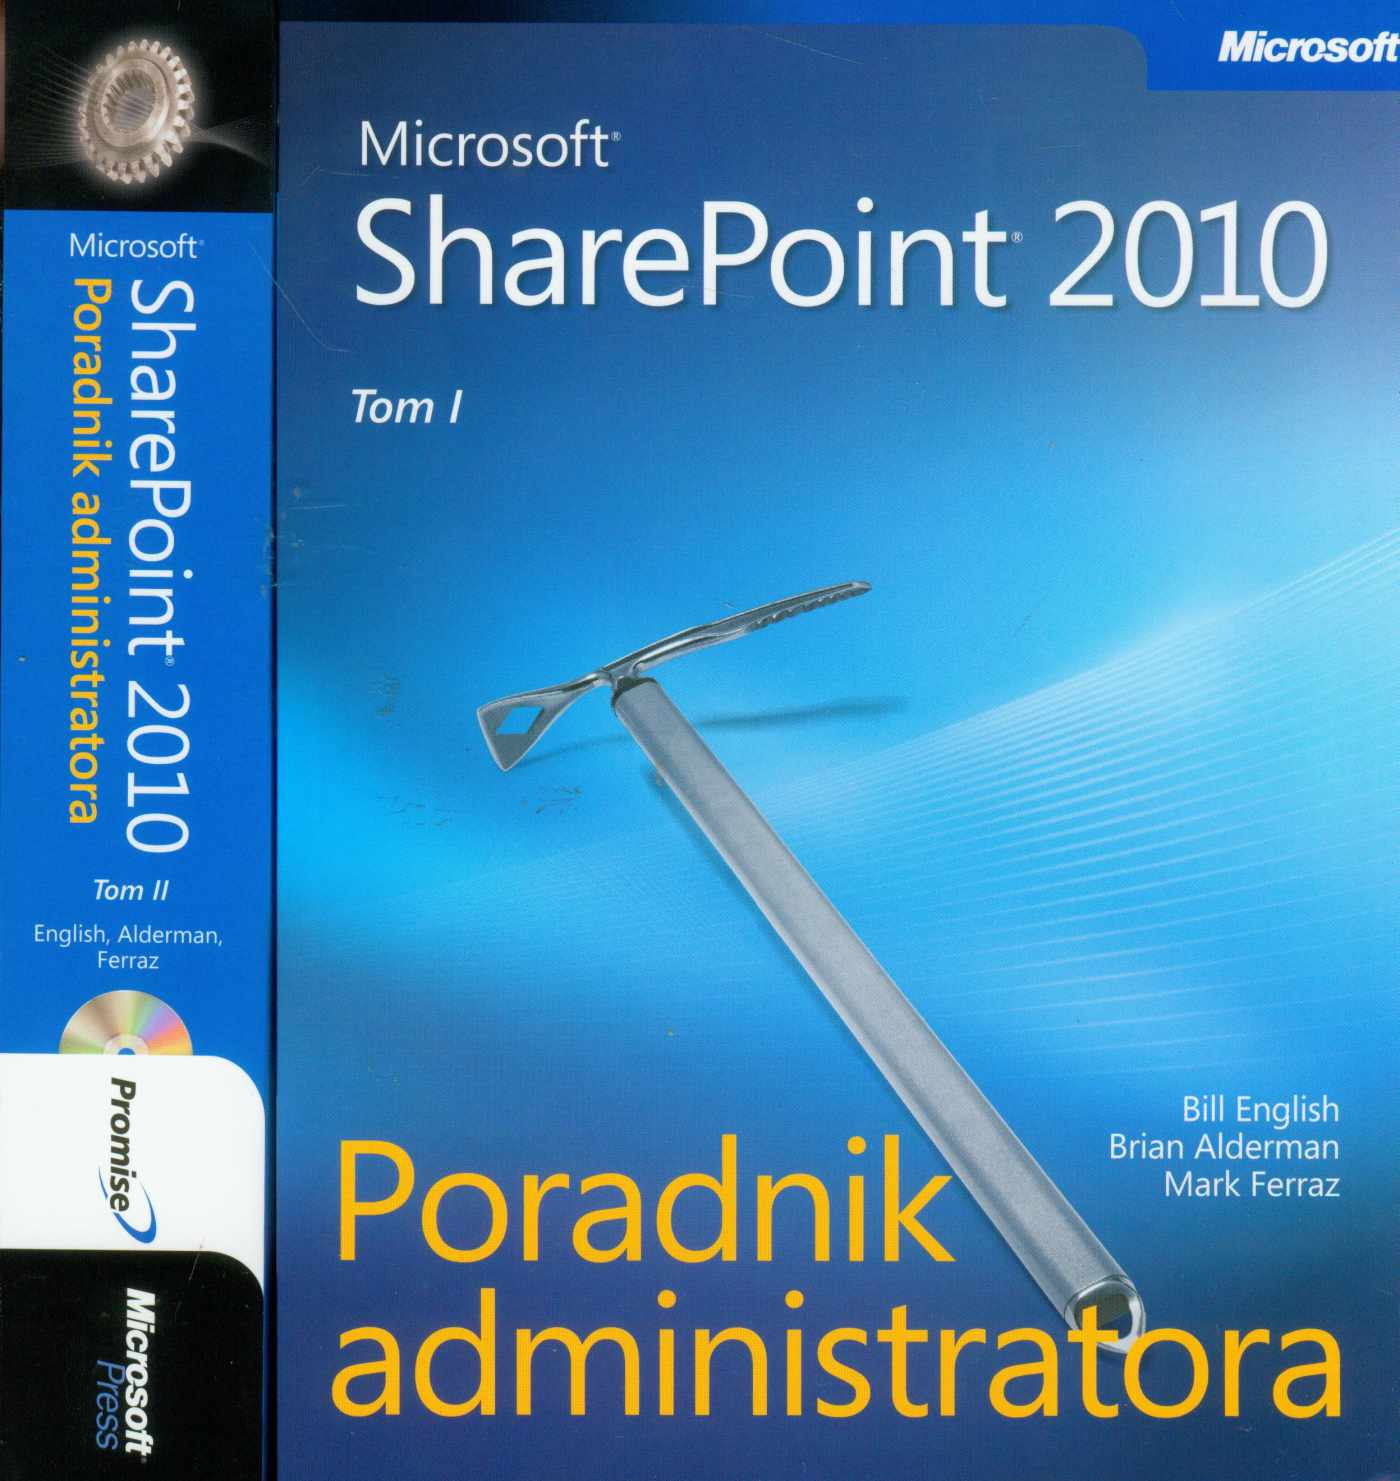 Microsoft SharePoint 2010 Poradnik Administratora - Tom 1 i 2 - Ebook (Książka PDF) do pobrania w formacie PDF